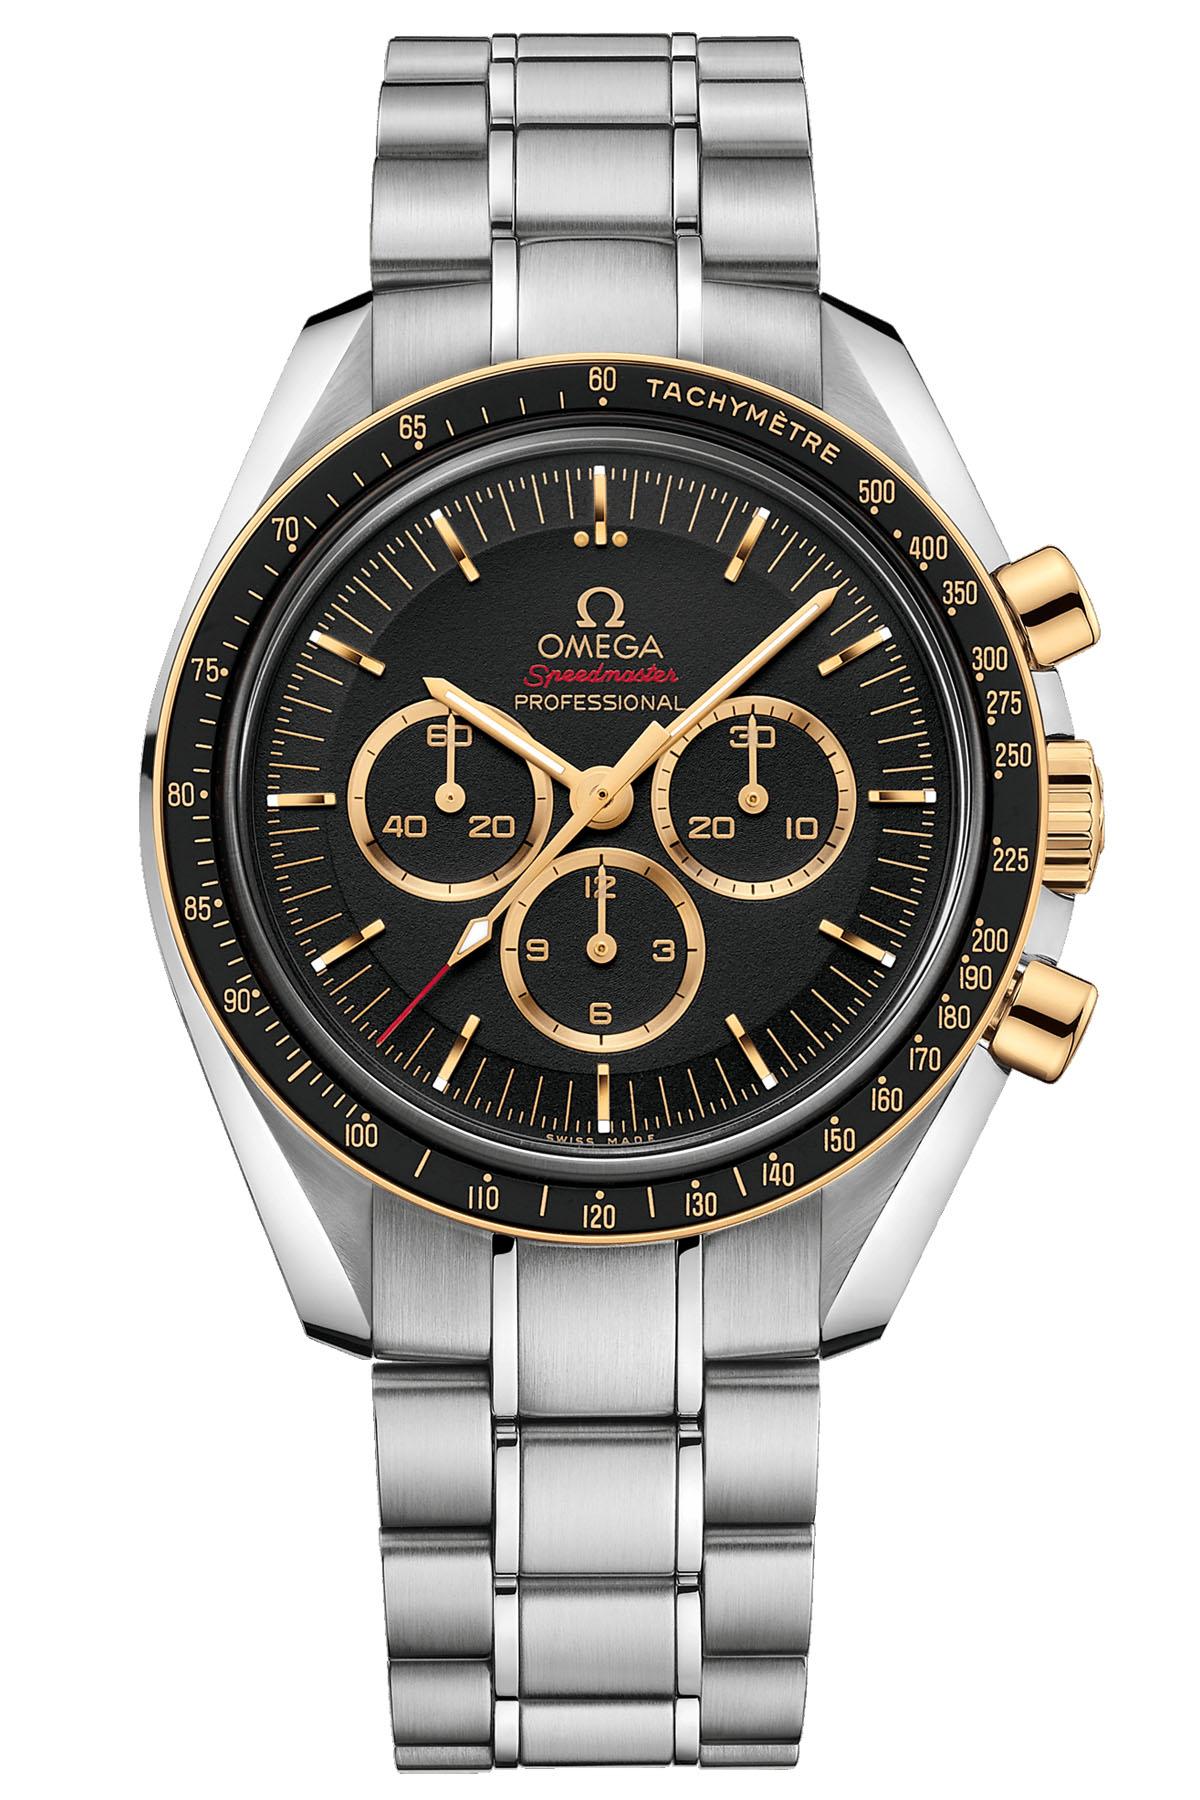 Omega Speedmaster Tokyo 2020 Olympics collection 52220423001001